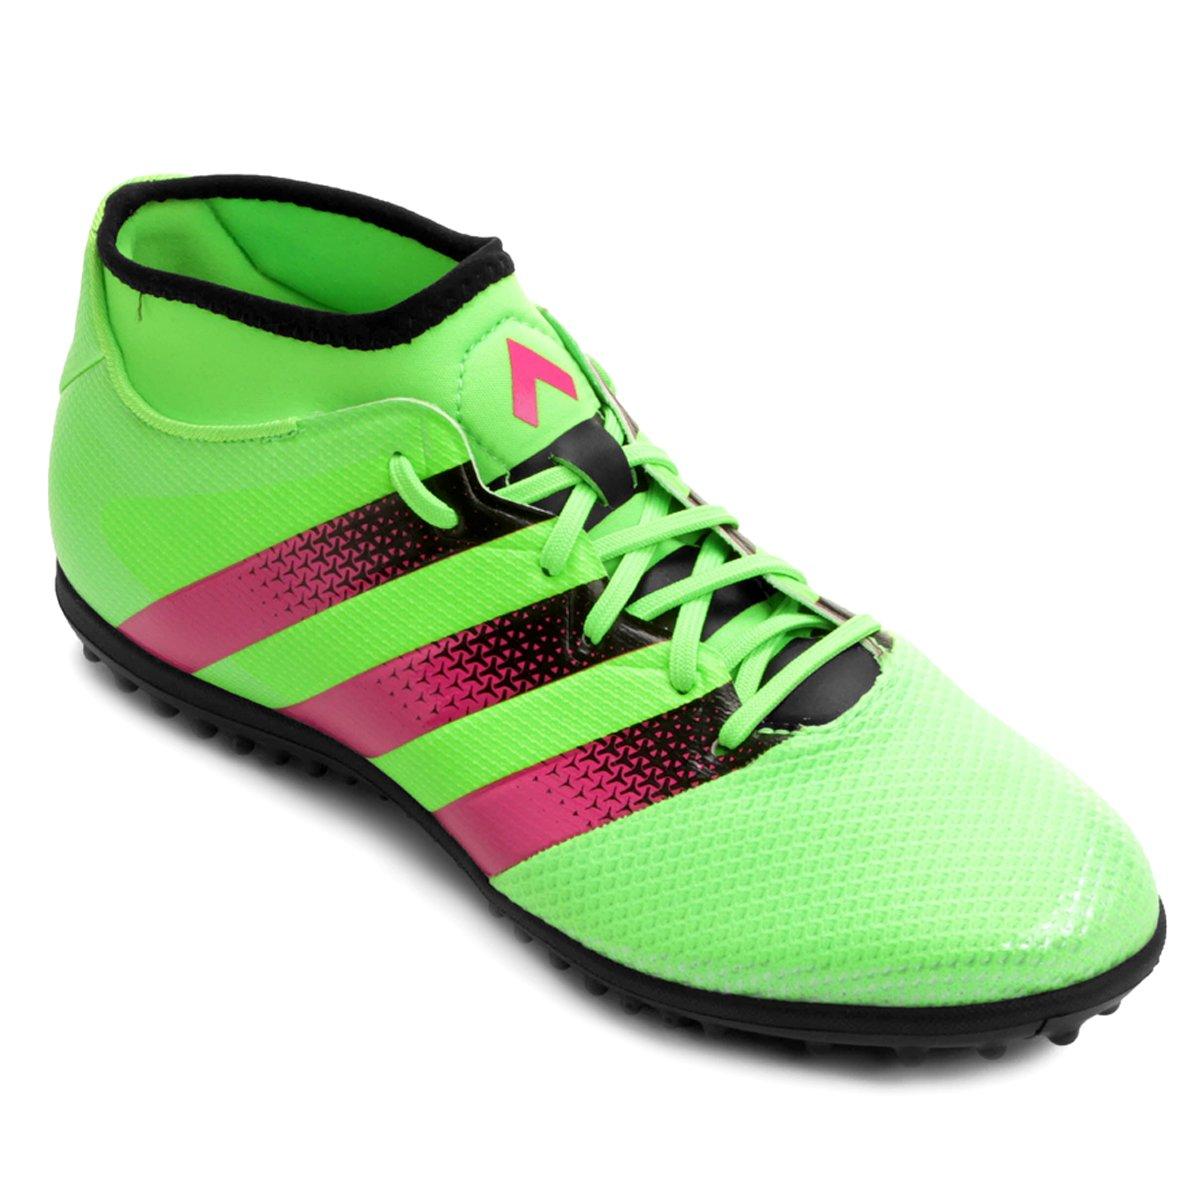 Chuteira Society Adidas Ace 16.3 Primemesh TF Masculina - Compre ... ef057402d7d37